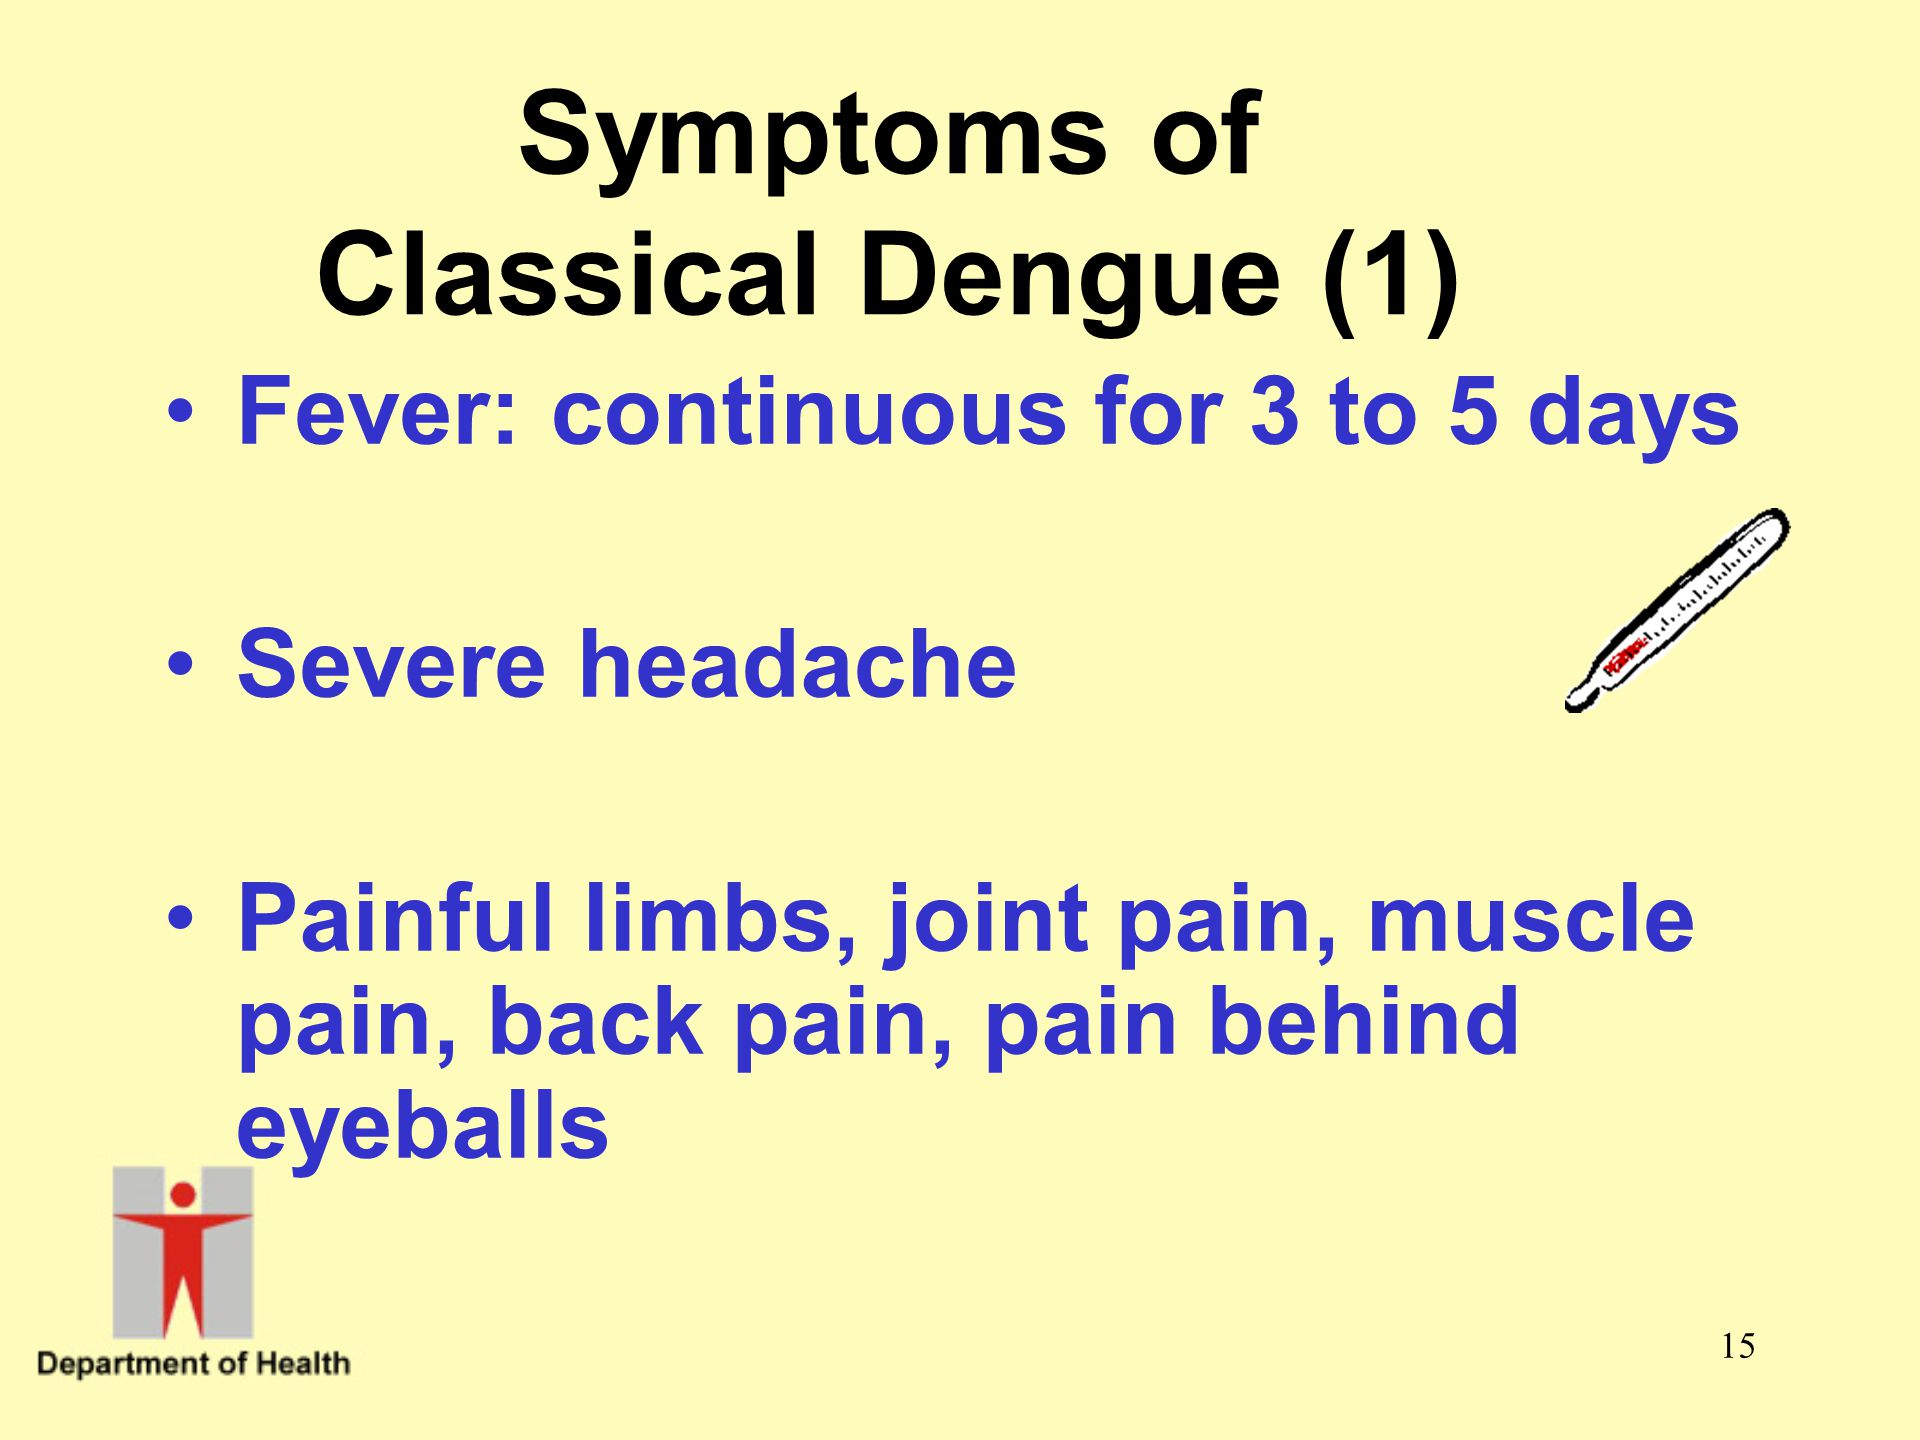 Symptoms of Classical Dengue (1)